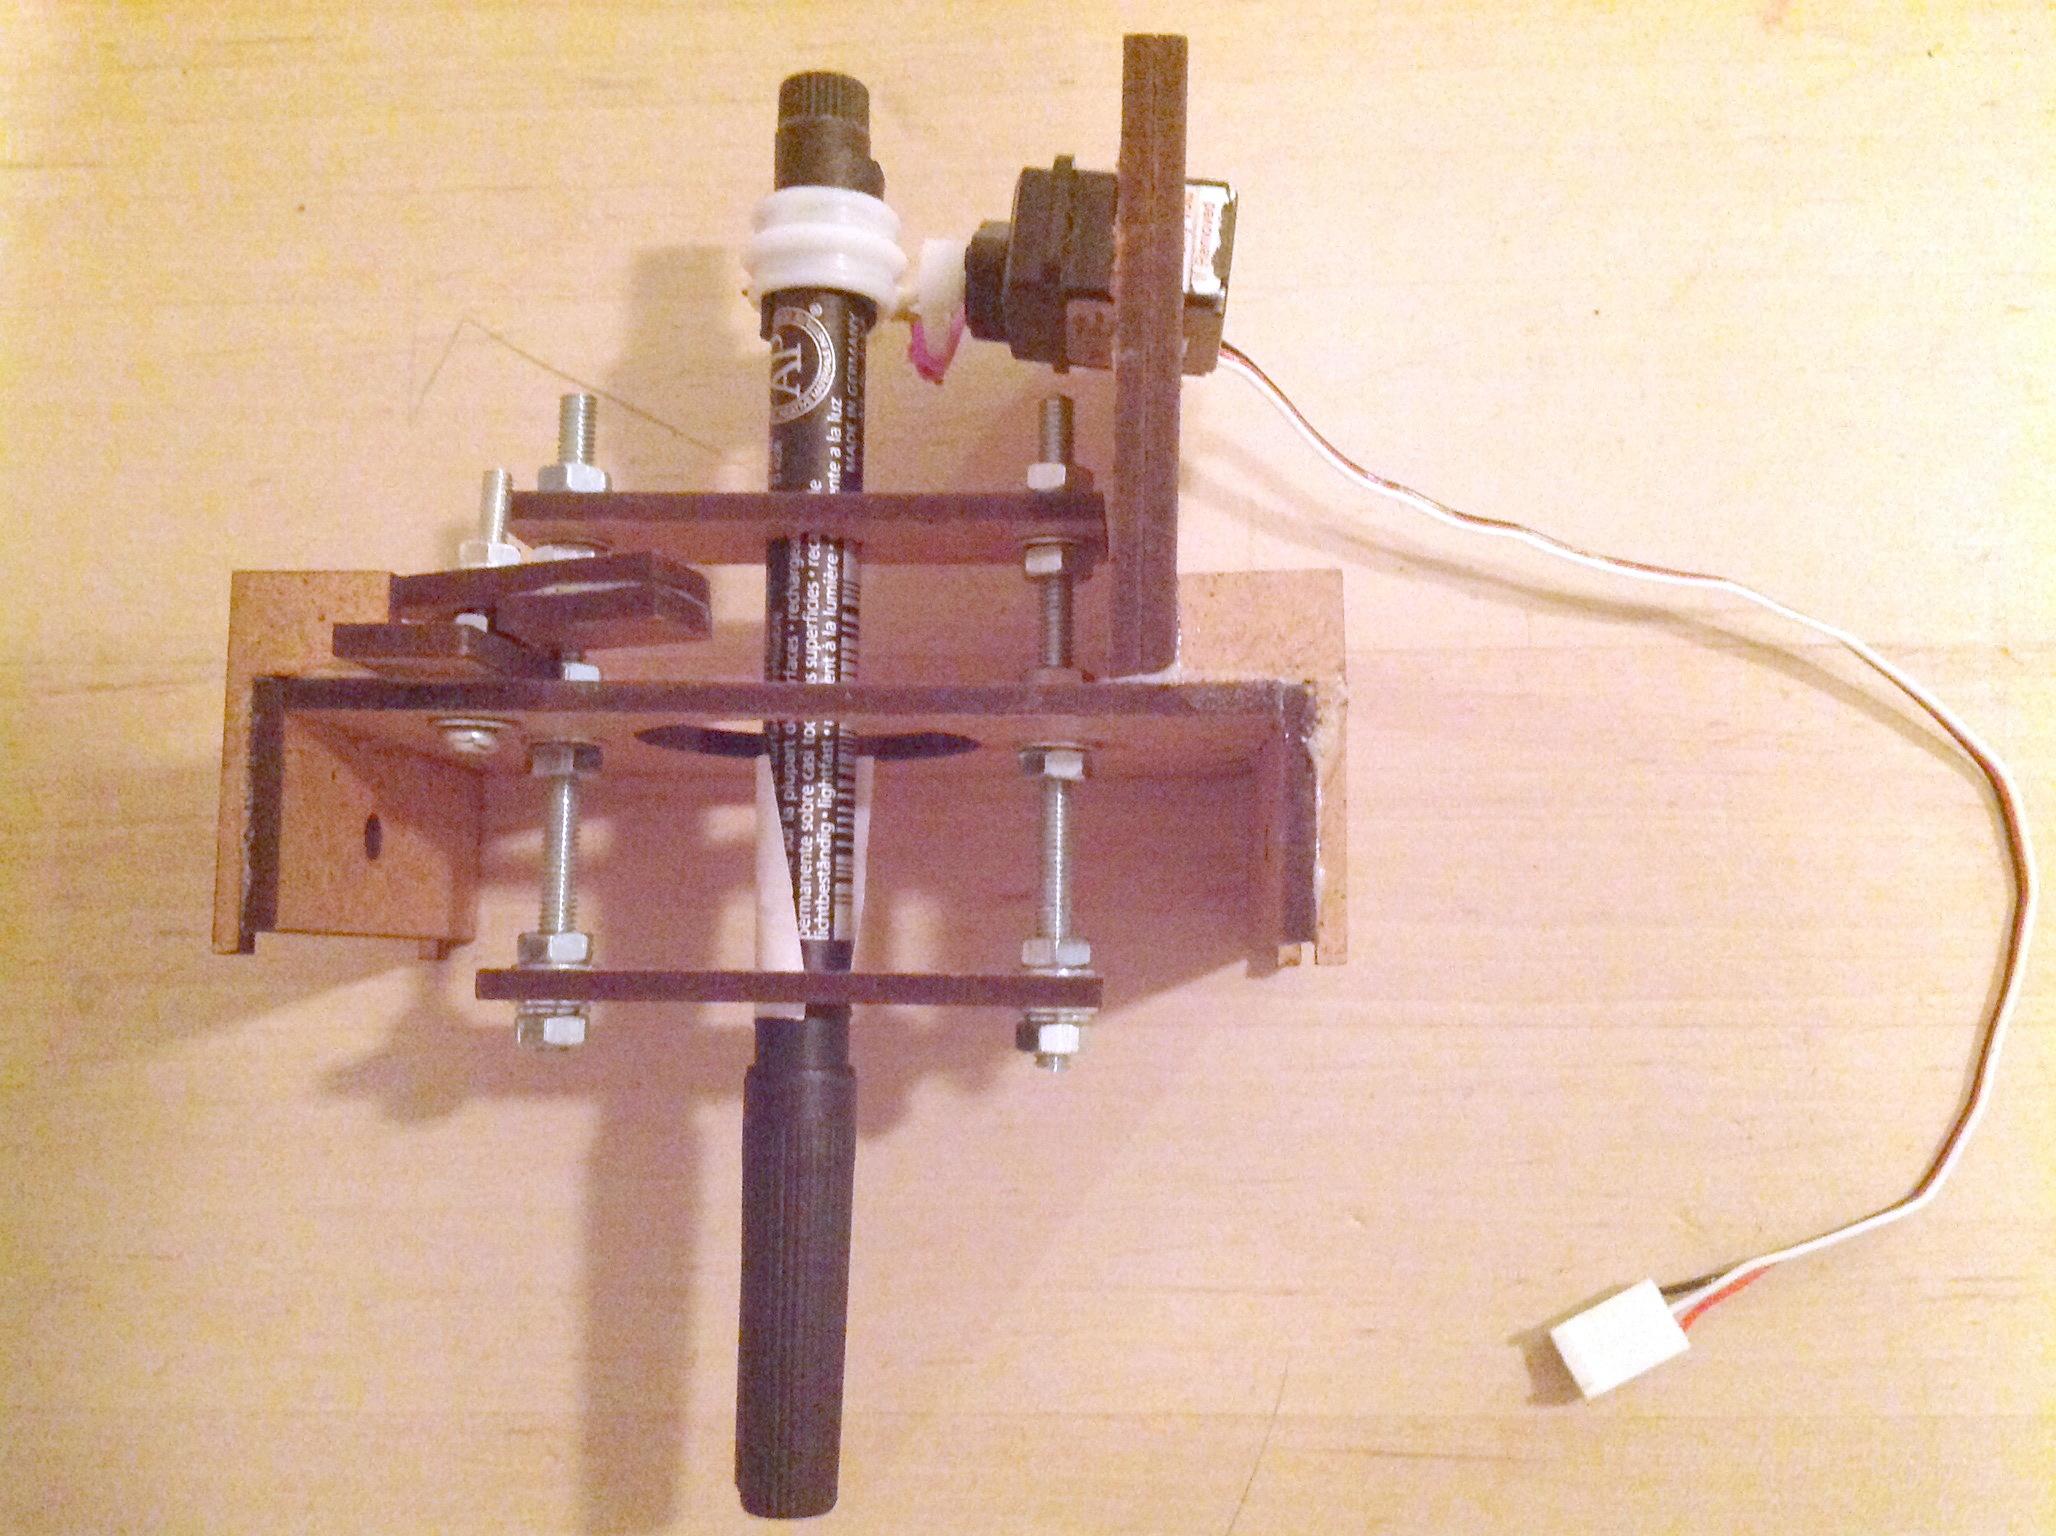 Pen holder assembled